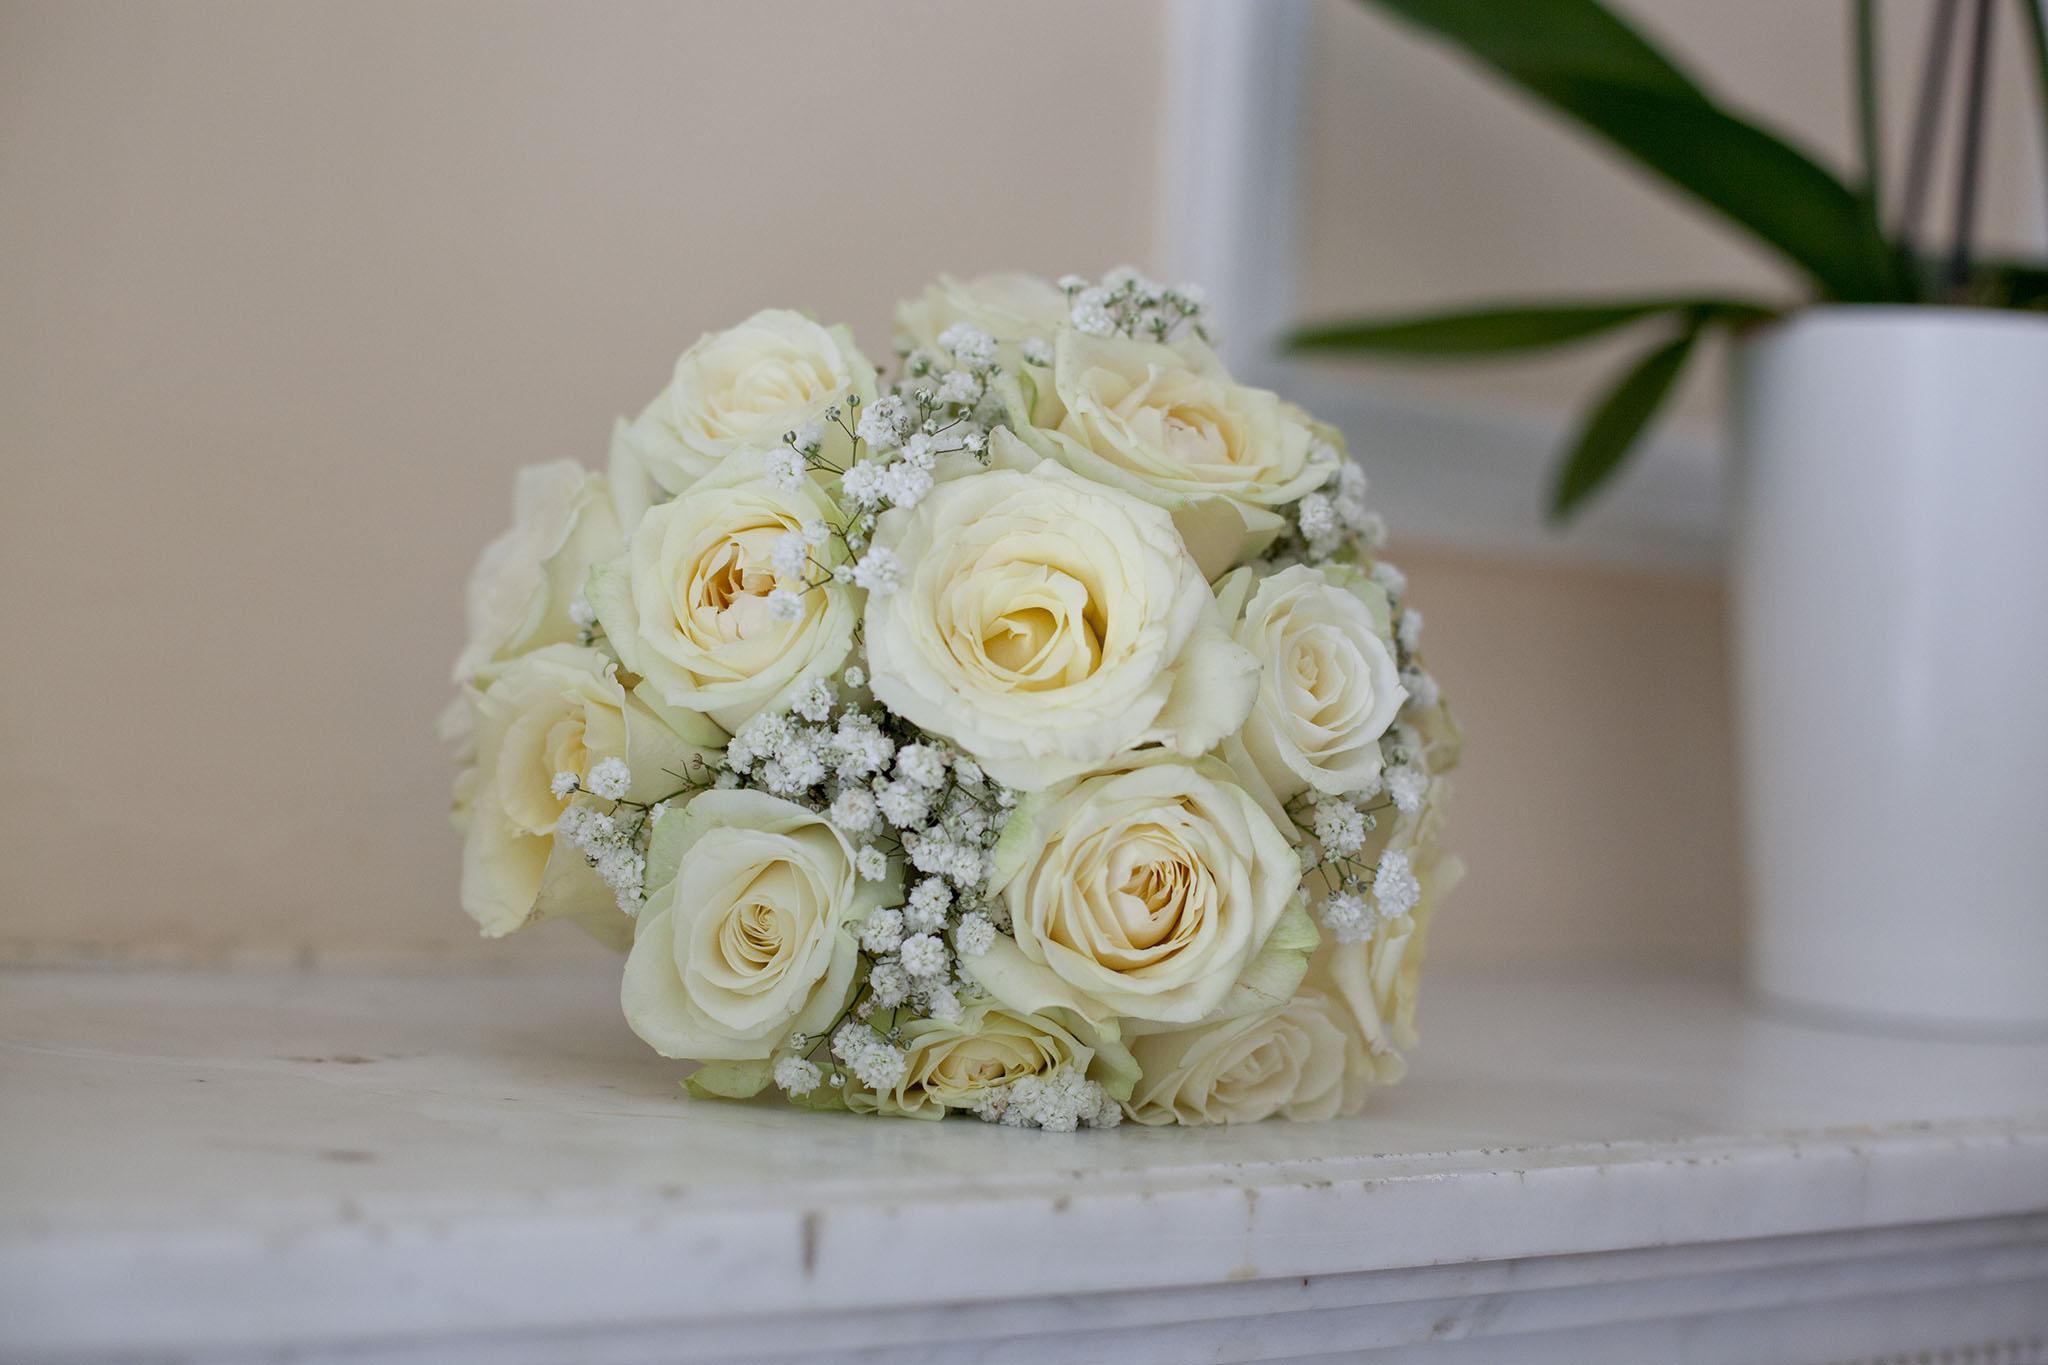 elizabethg_fineart_photography_hertfordshire_rachel_adam_wedding_highelmsmanor_12.jpg